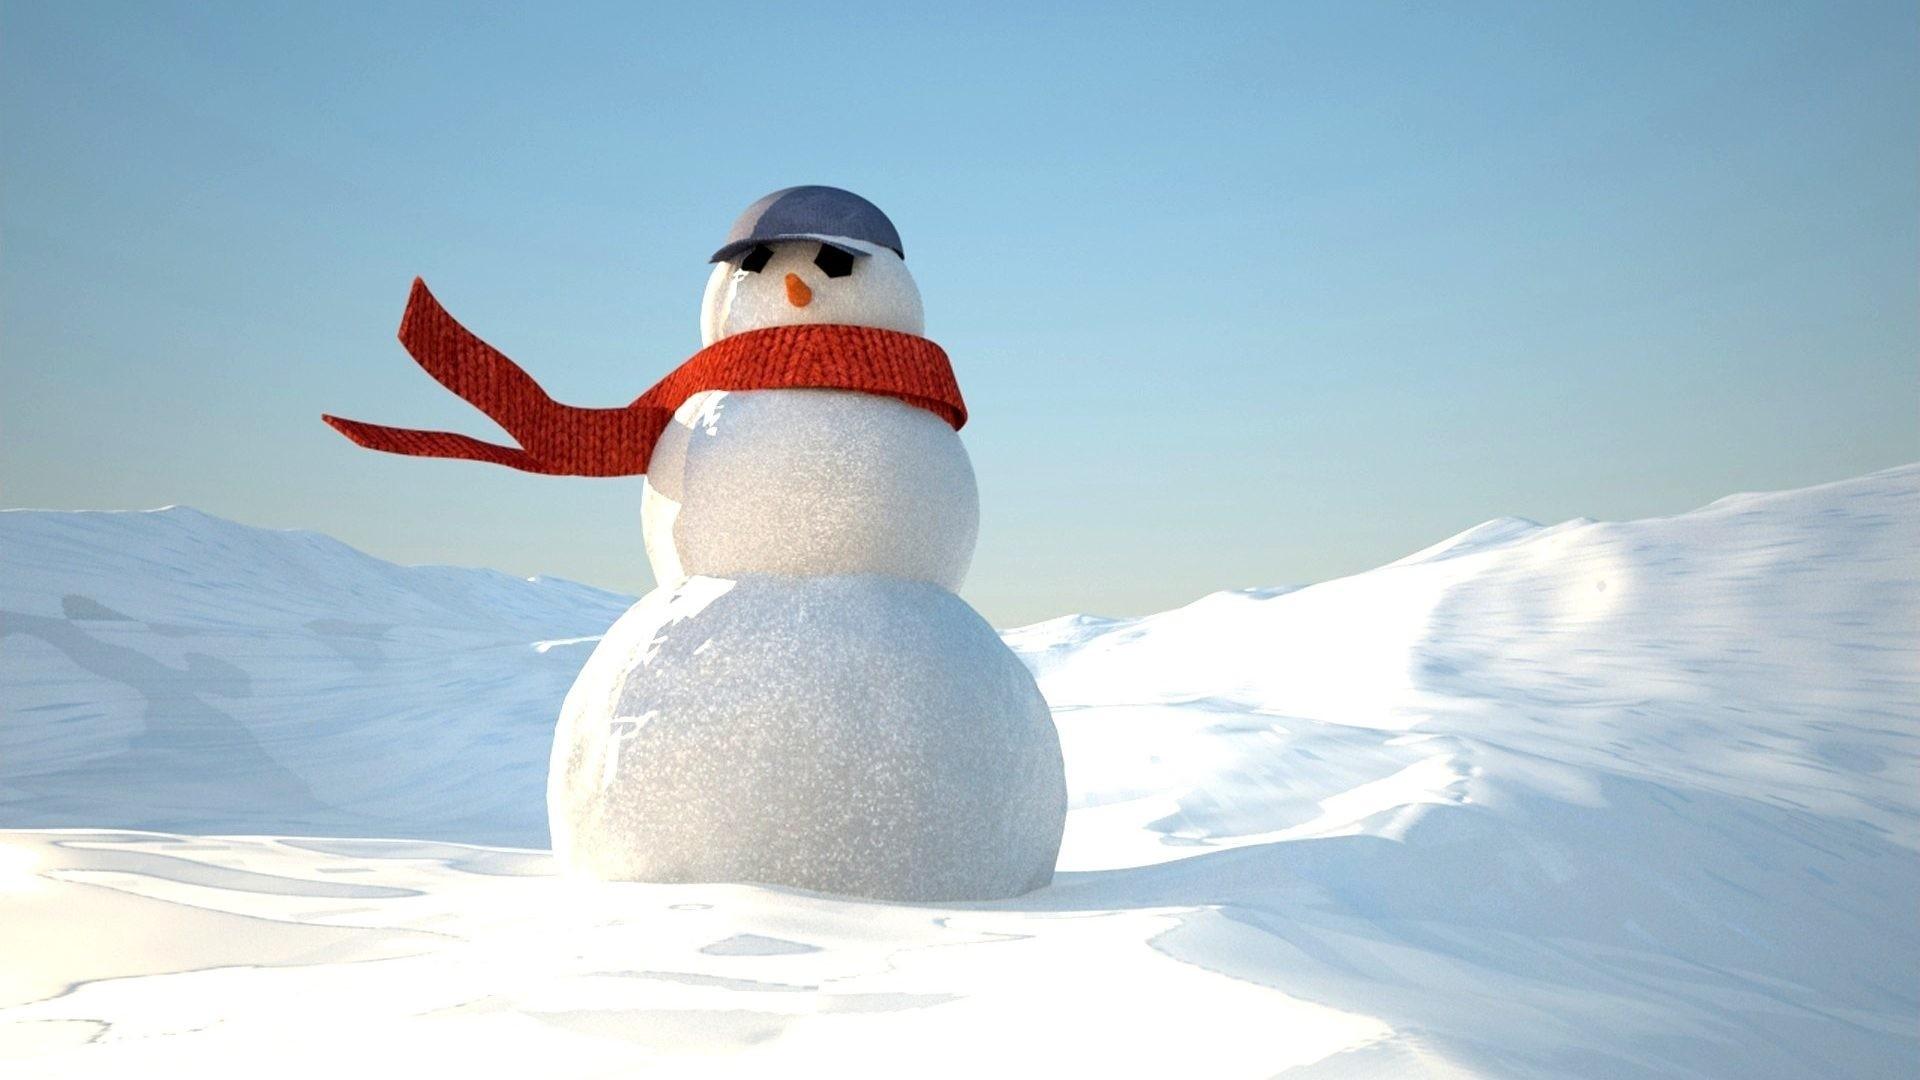 Snowman Wallpaper for pc